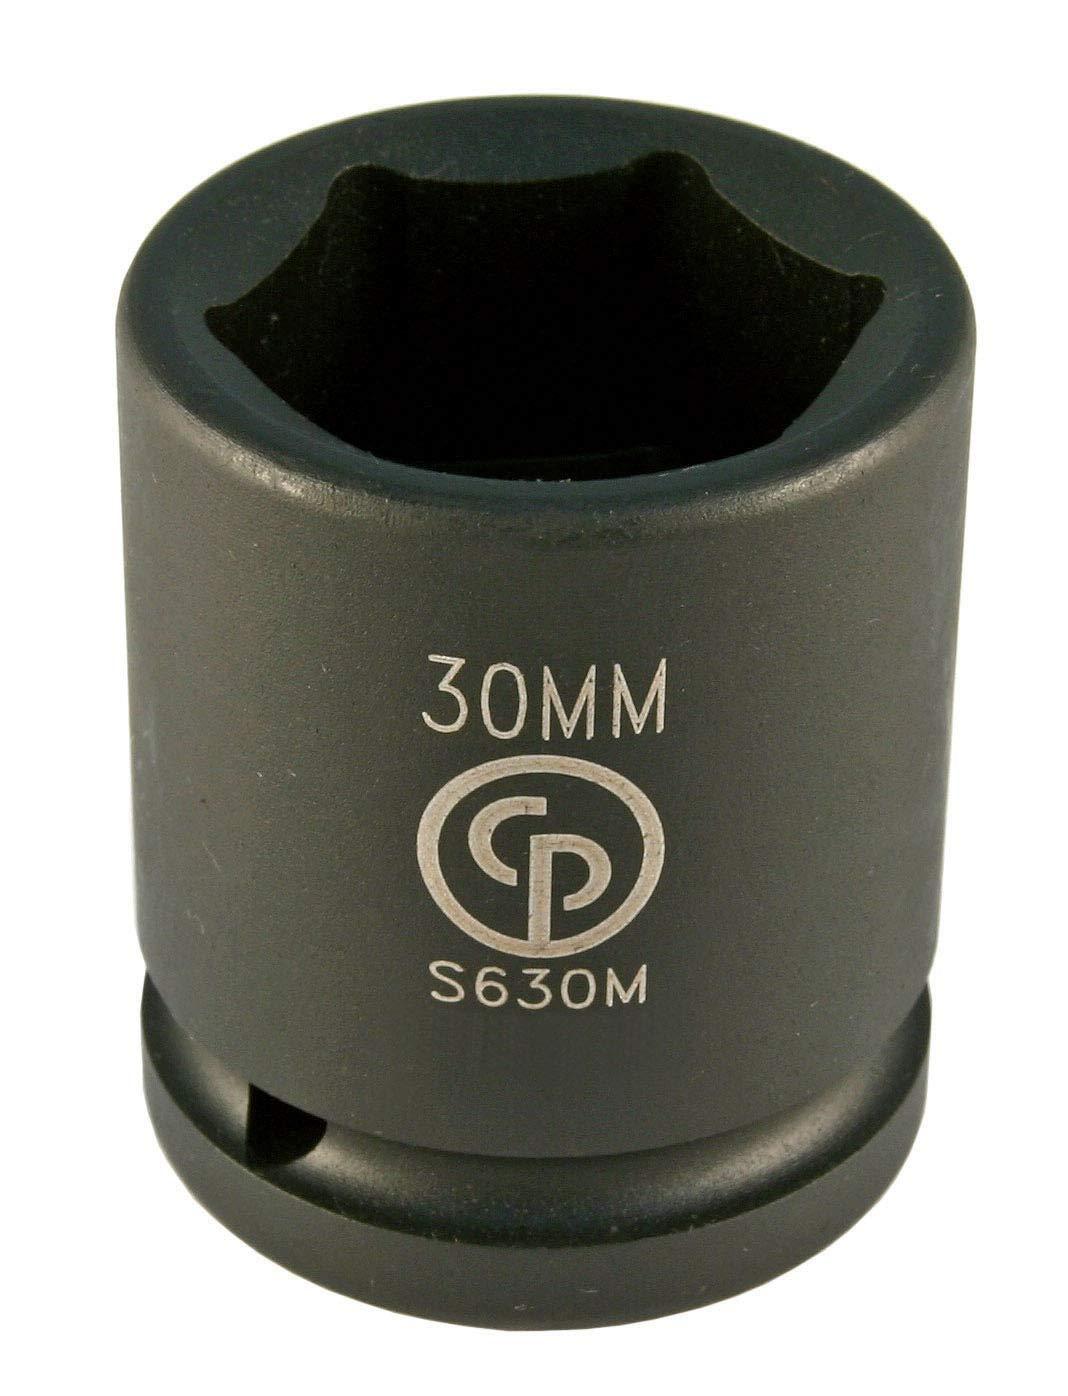 Chicago Pneumatic S630M 3//4 Dr Std Impact Socket 30mm Chicogo Pneumatic